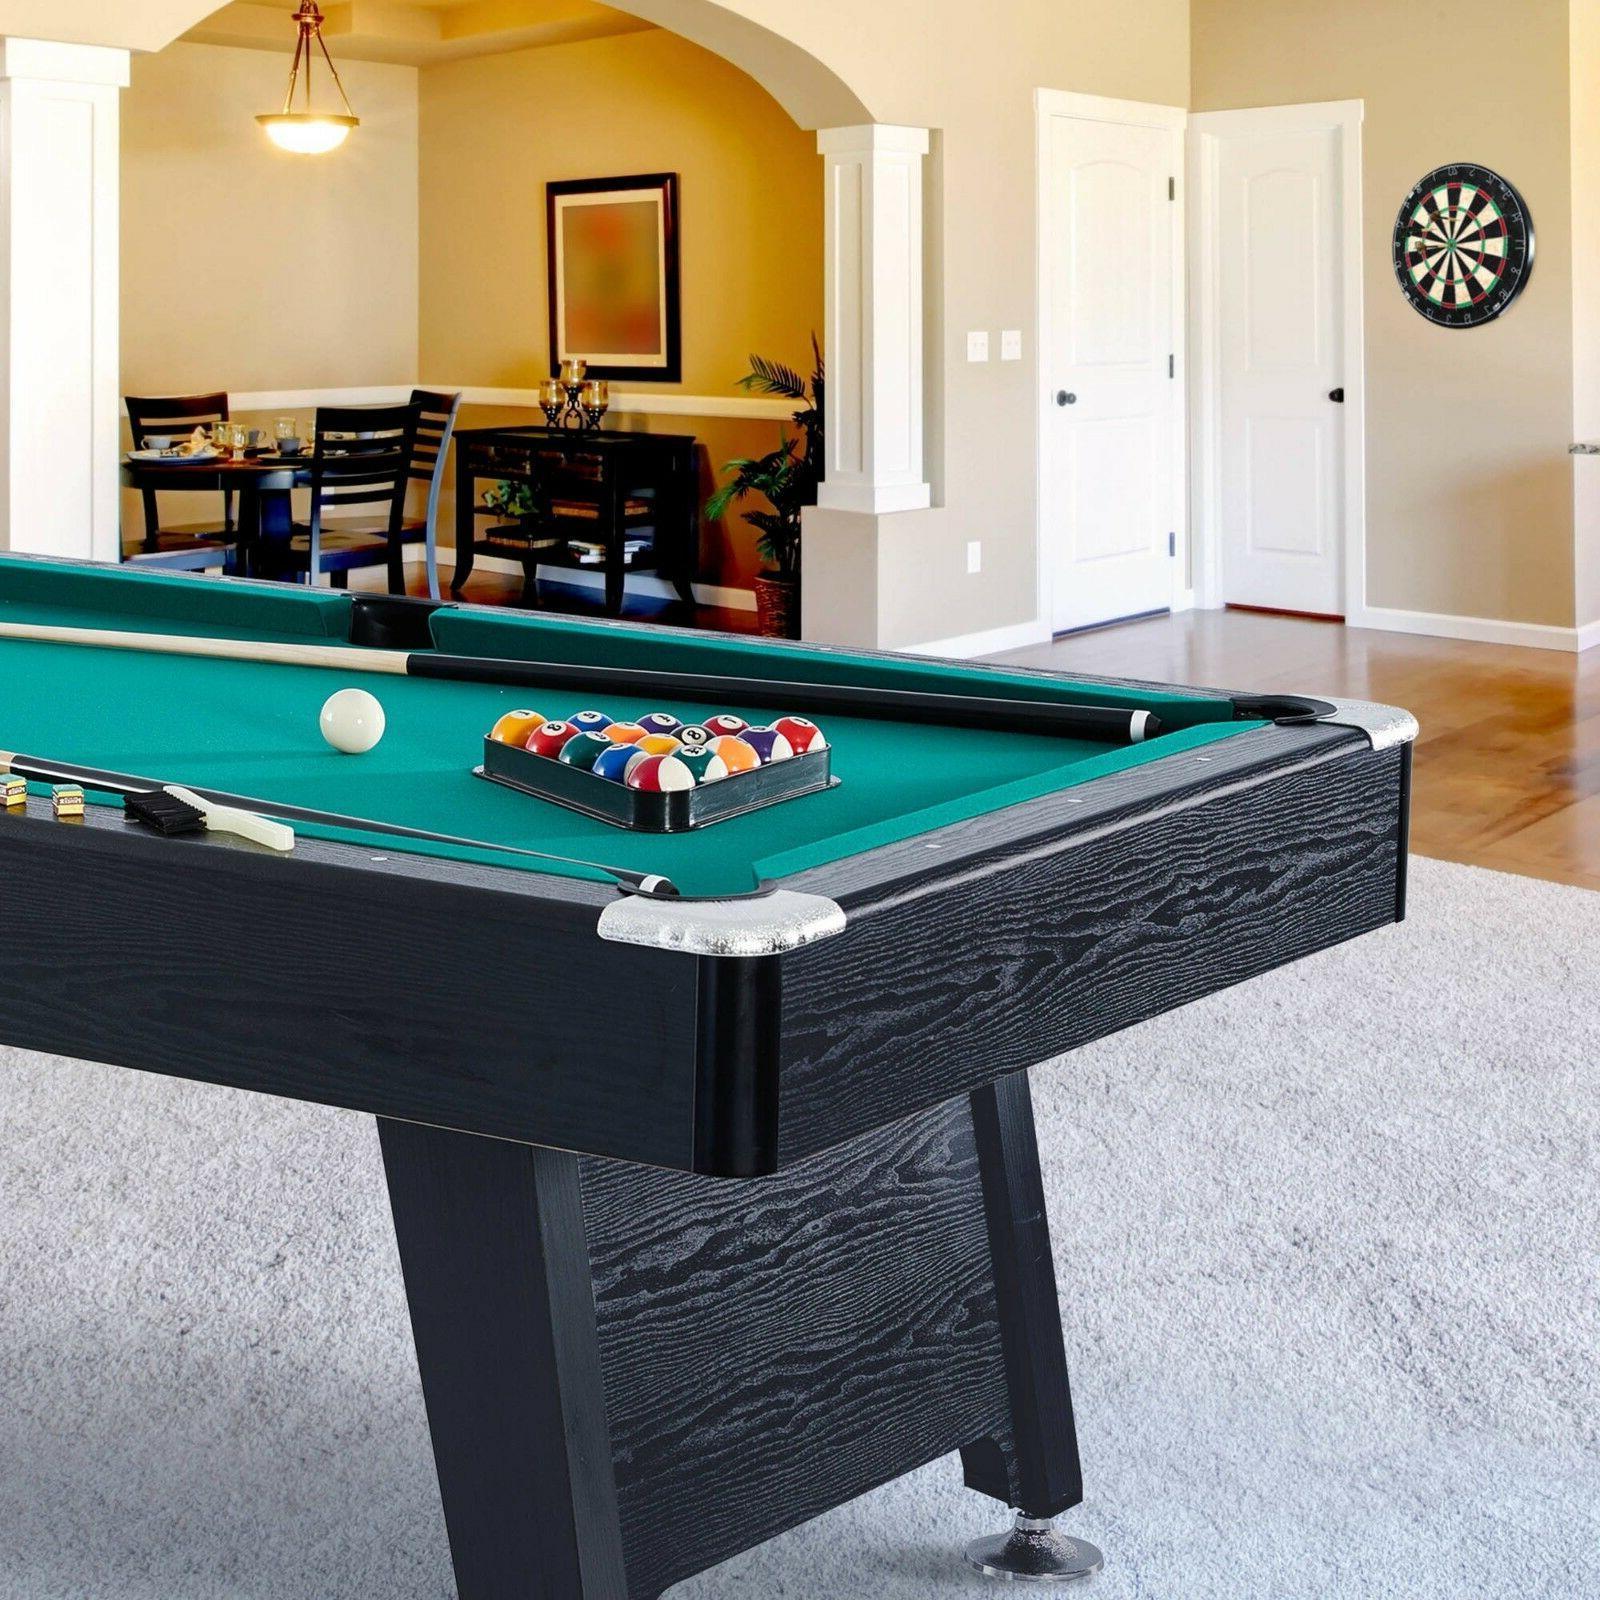 Pool 84-inch Billiard Table Bonus Dartboard Set